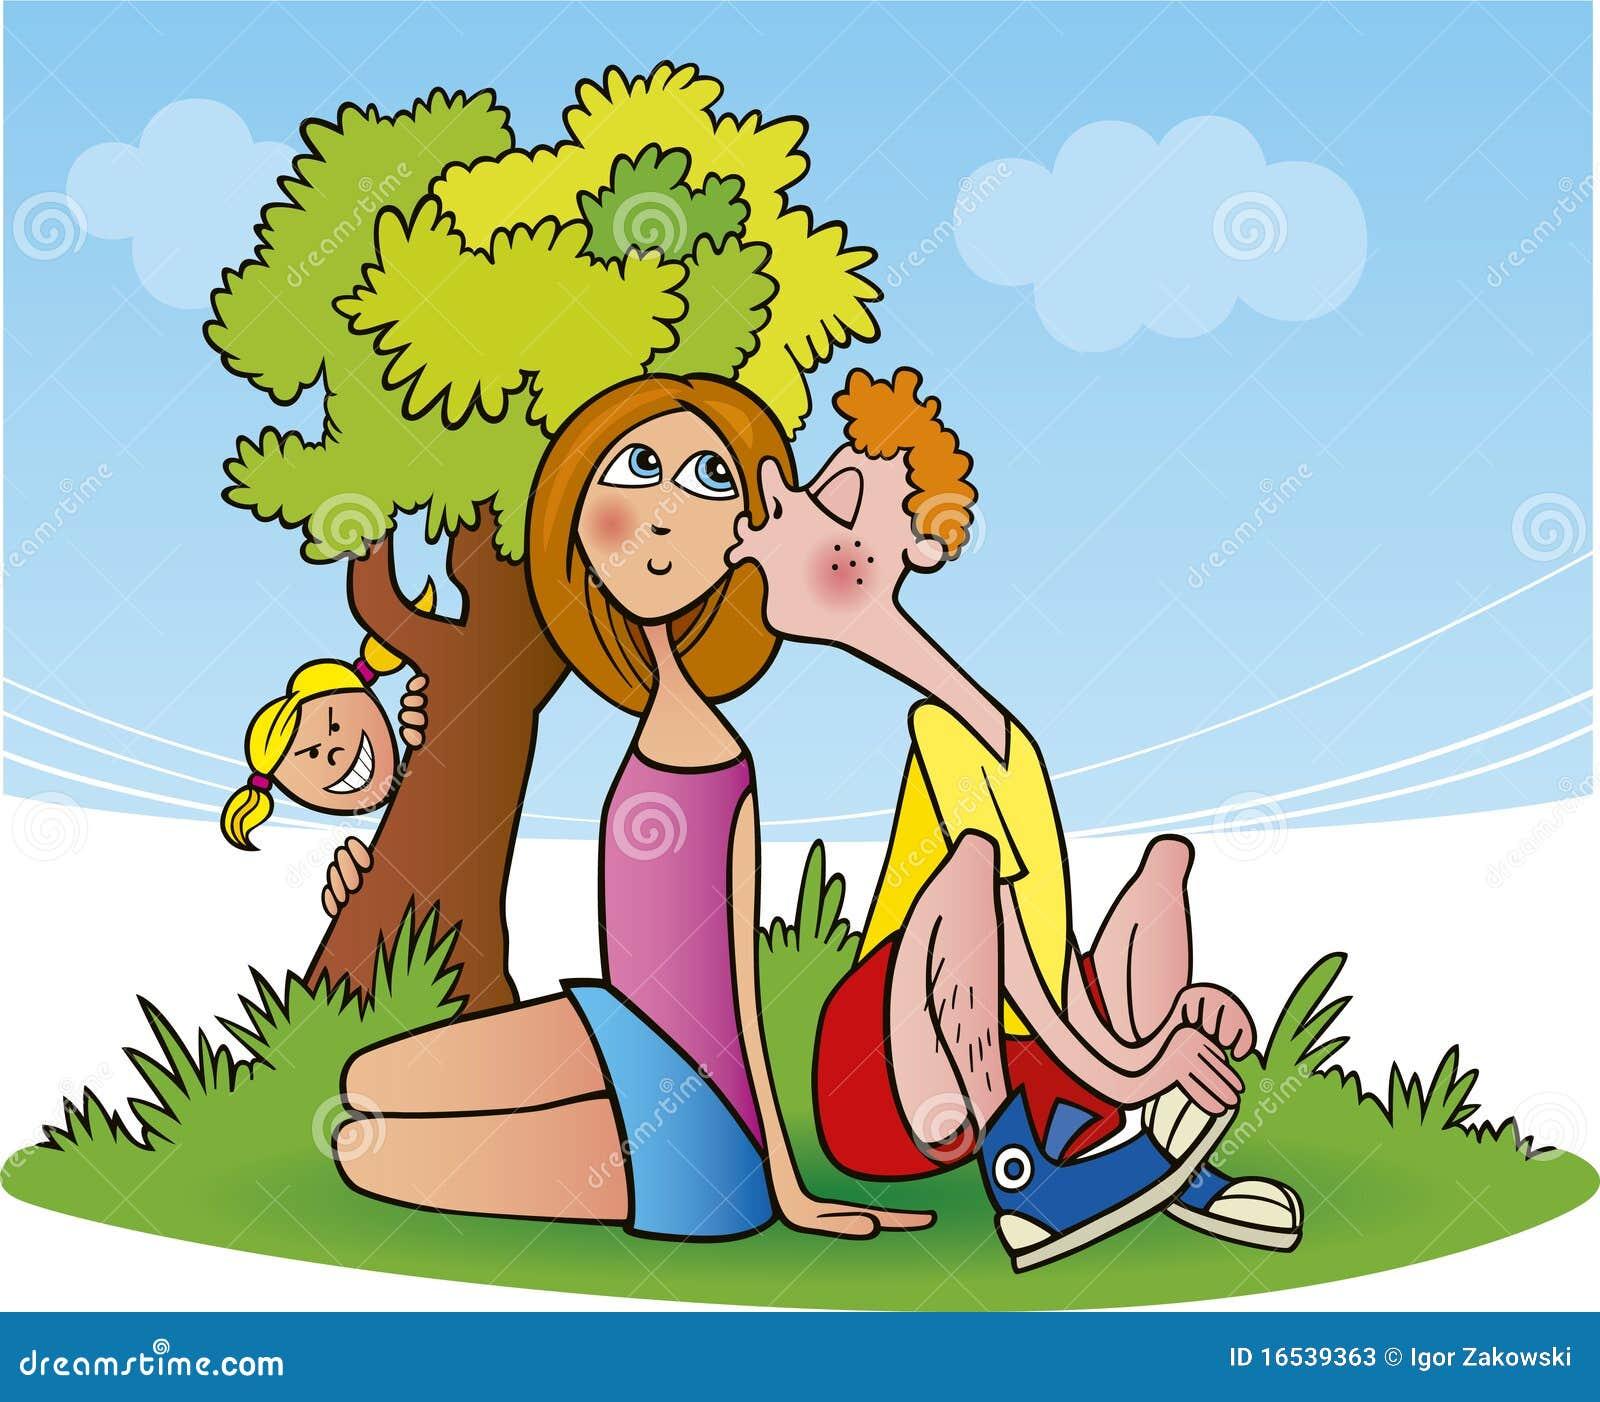 Teens in love stock vector. Illustration of love, girl ...